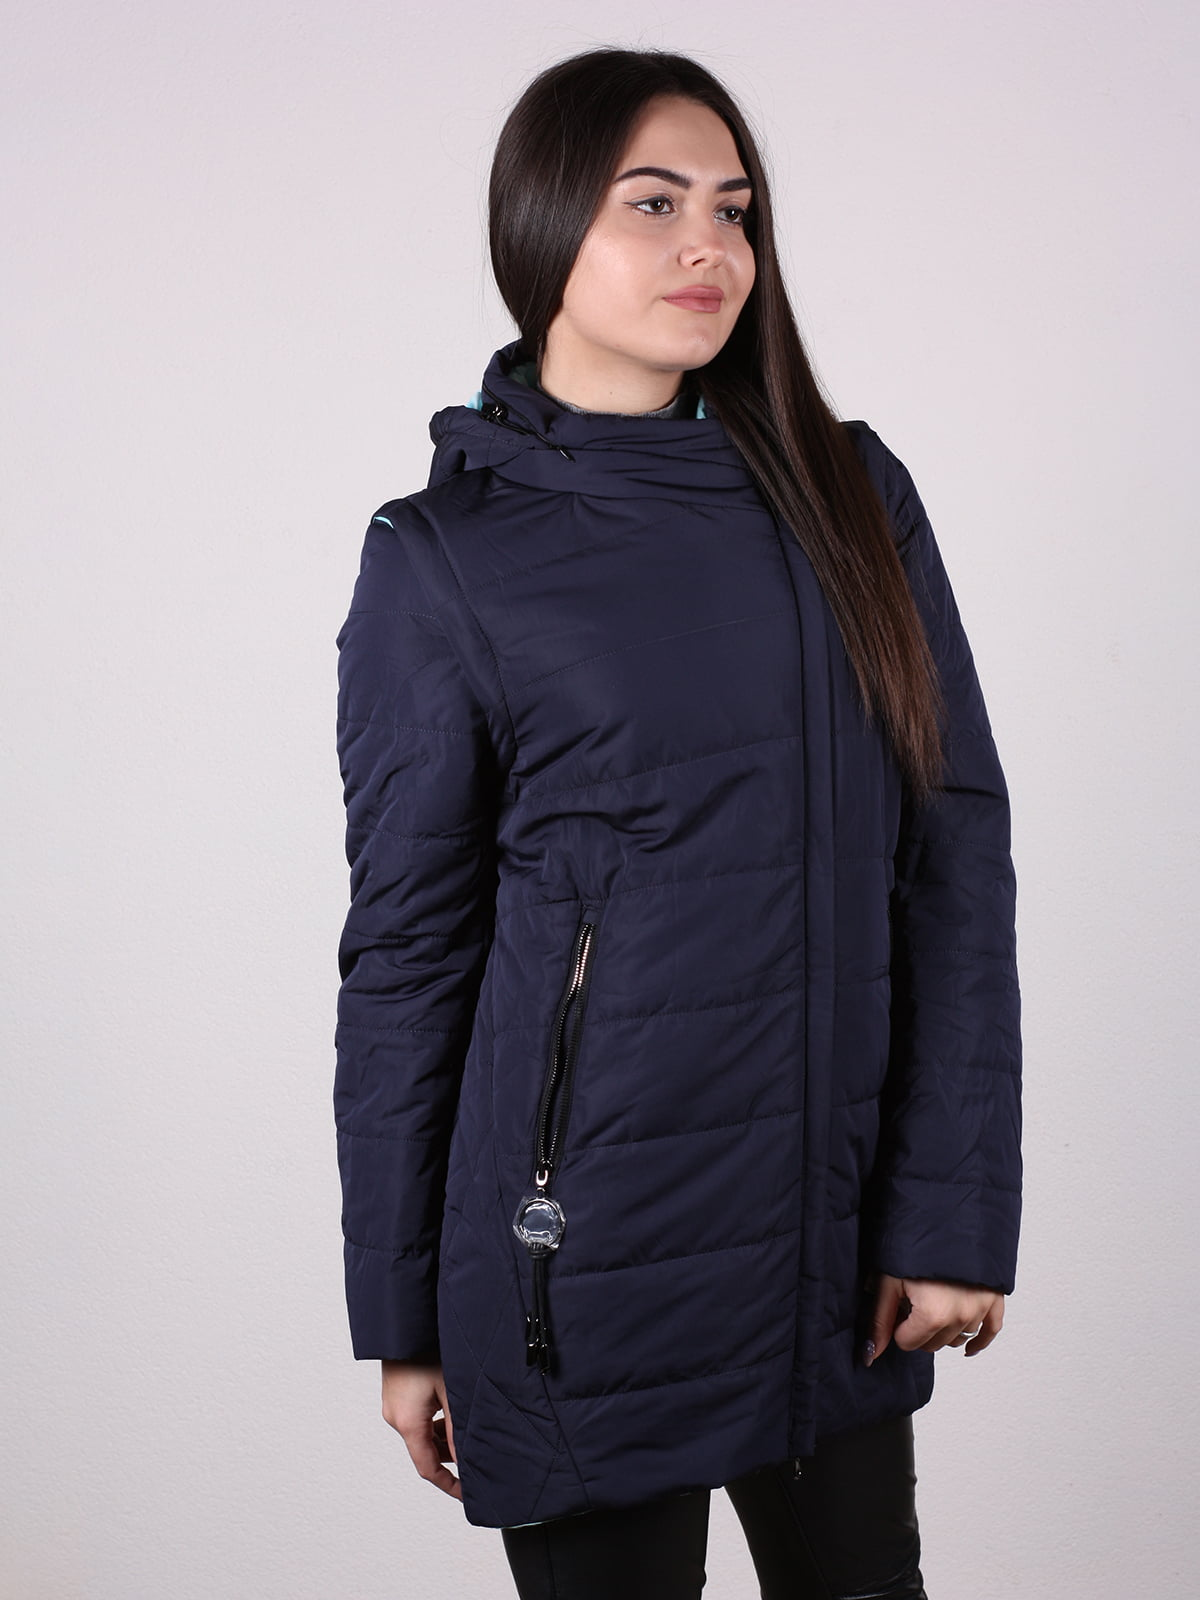 Куртка темно-синяя   4922471   фото 3